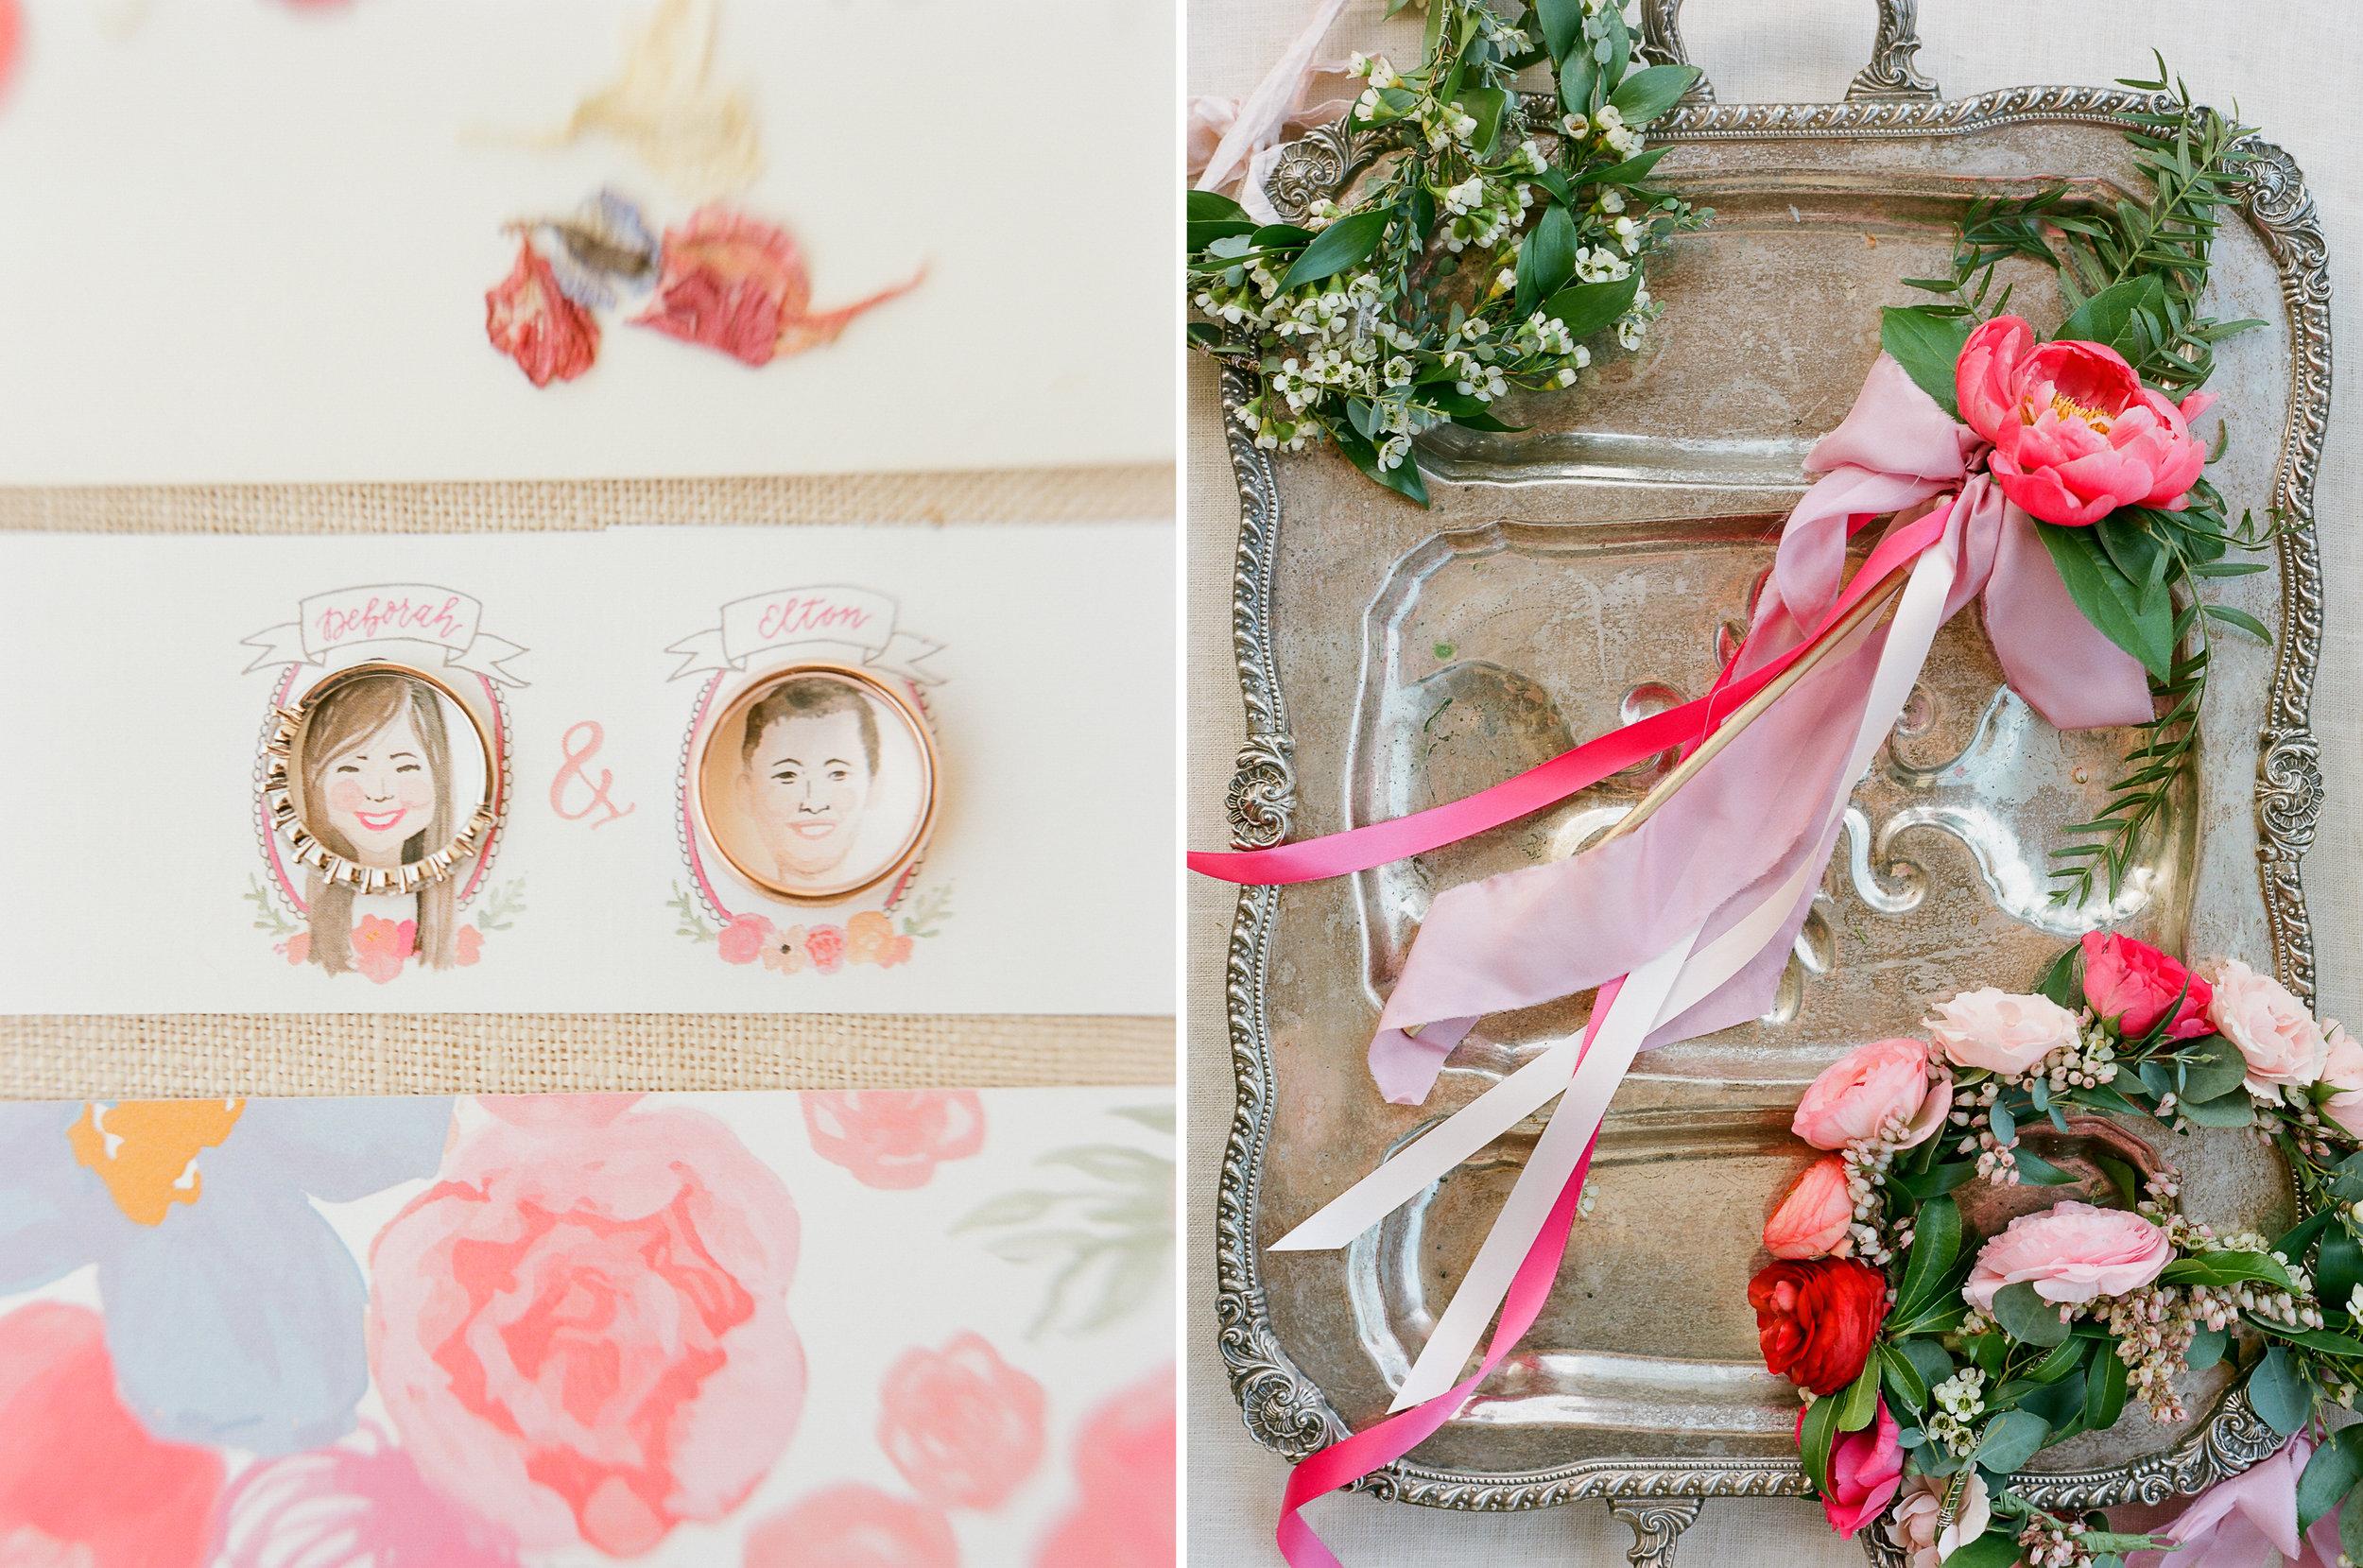 The-Knot-50-Weddings-50-States-Texas-Winner-Dana-Fernandez-photography-houston-wedding-photographer-film-fine-art-destination-101.jpg